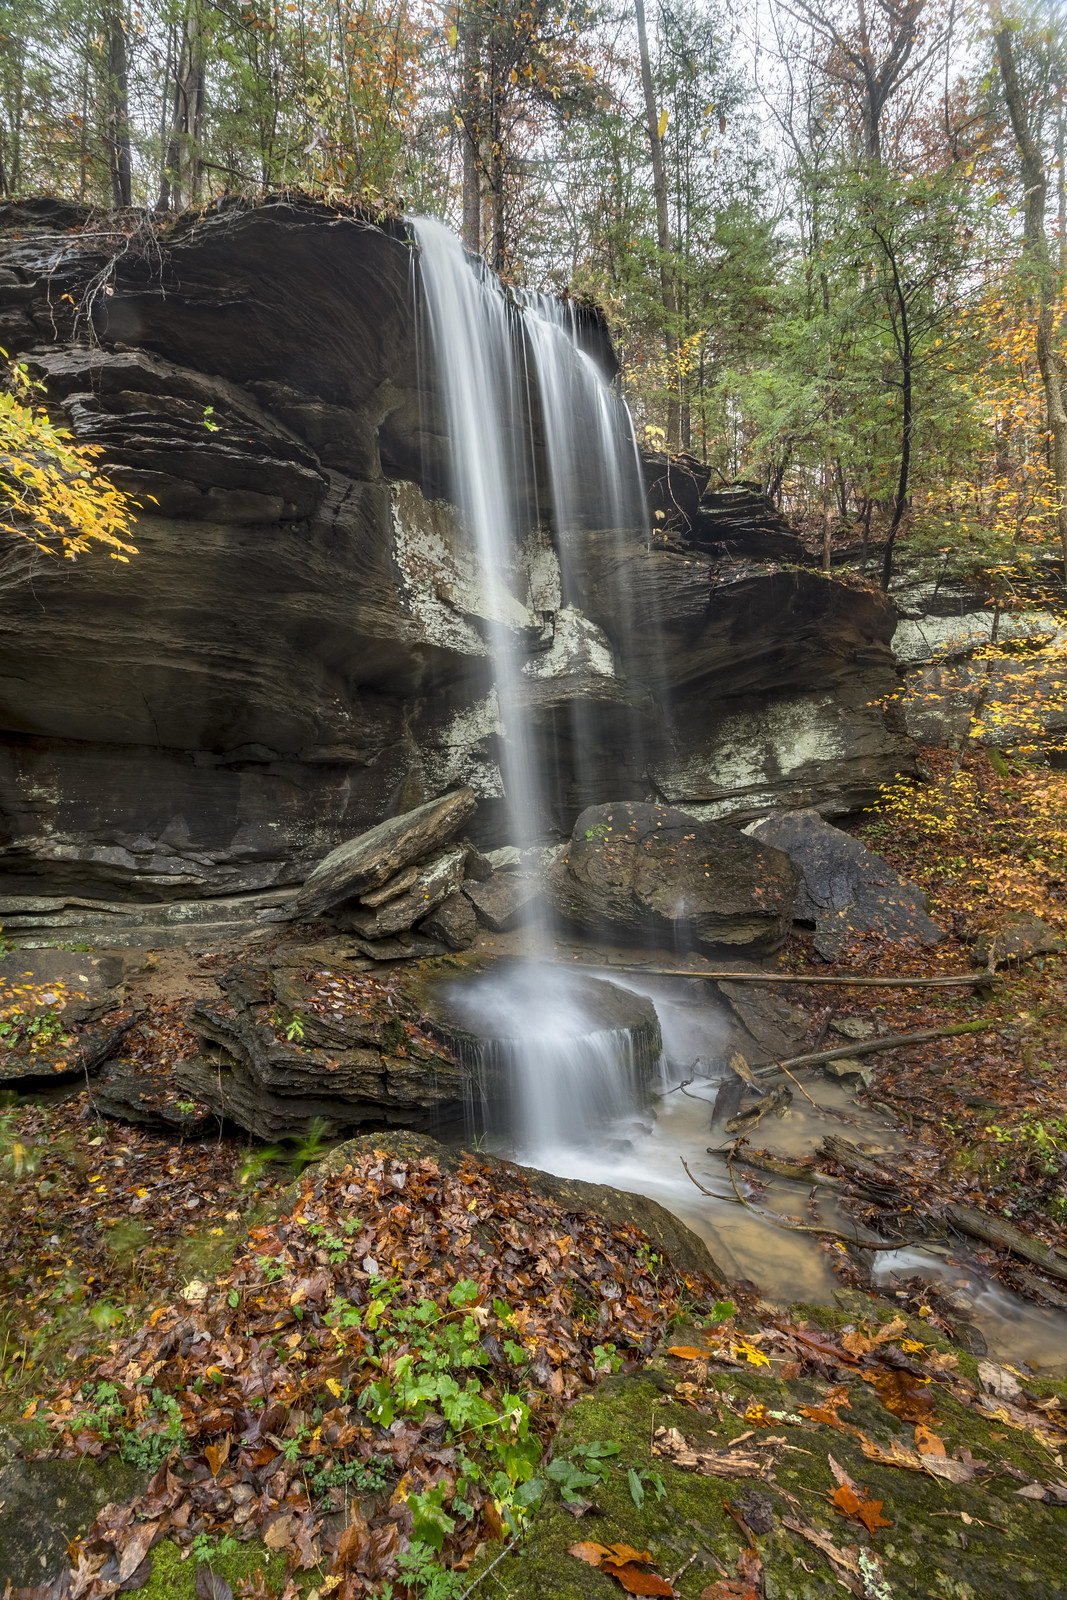 Wheeler Falls, Fall Creek Falls SP, Van Buren County, Tennessee 6